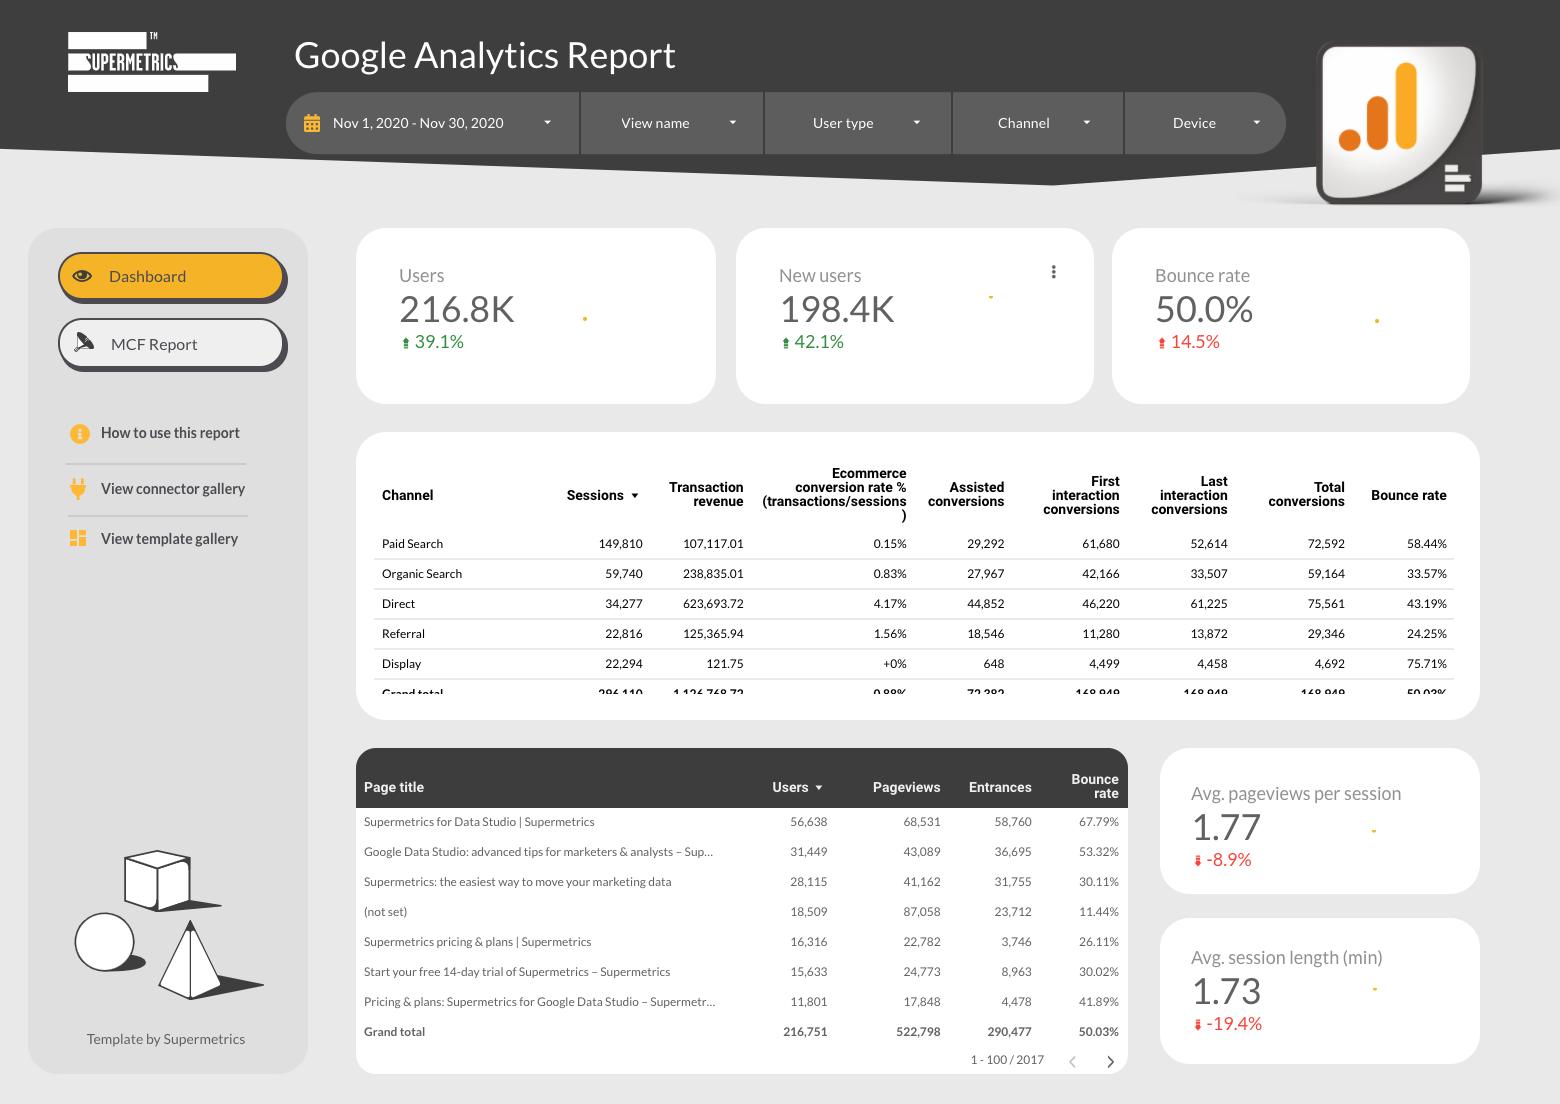 google analytics report by supermetrics about website performance